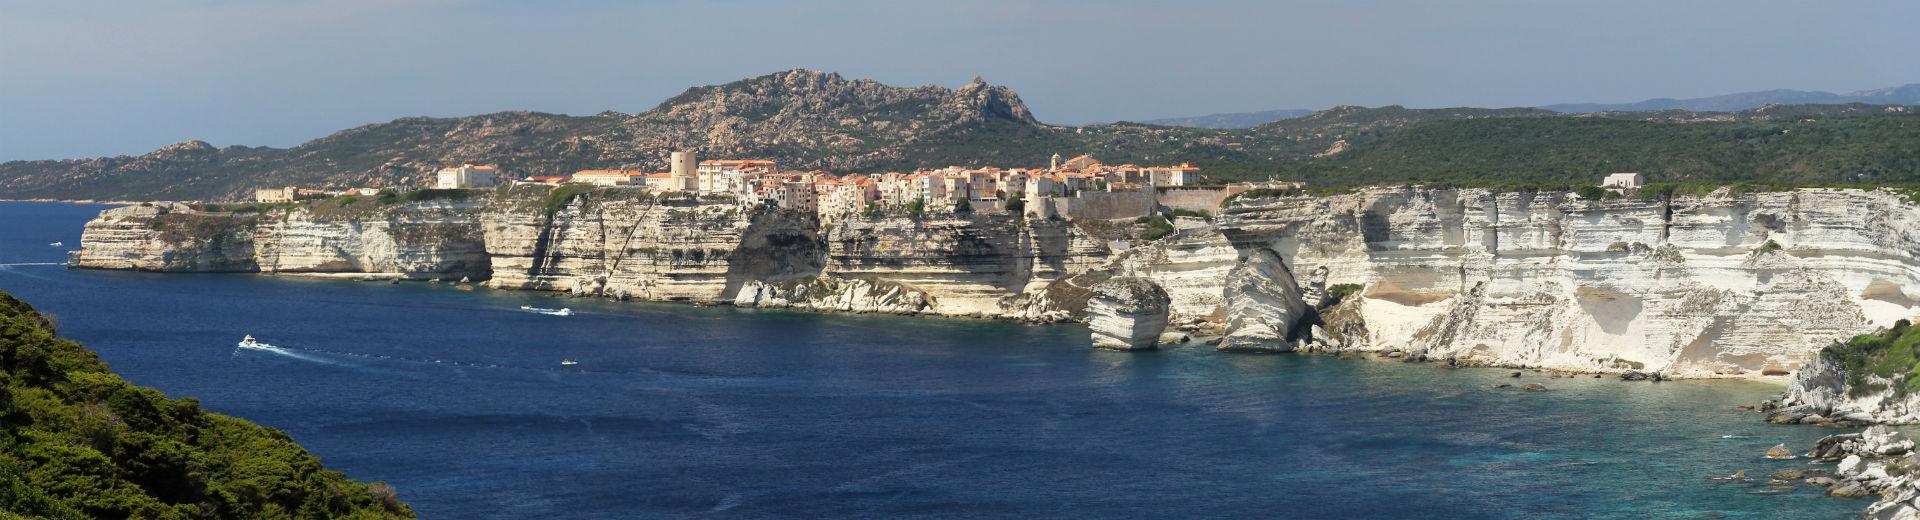 Korsika - Geführte Rundreise - Isola Bella